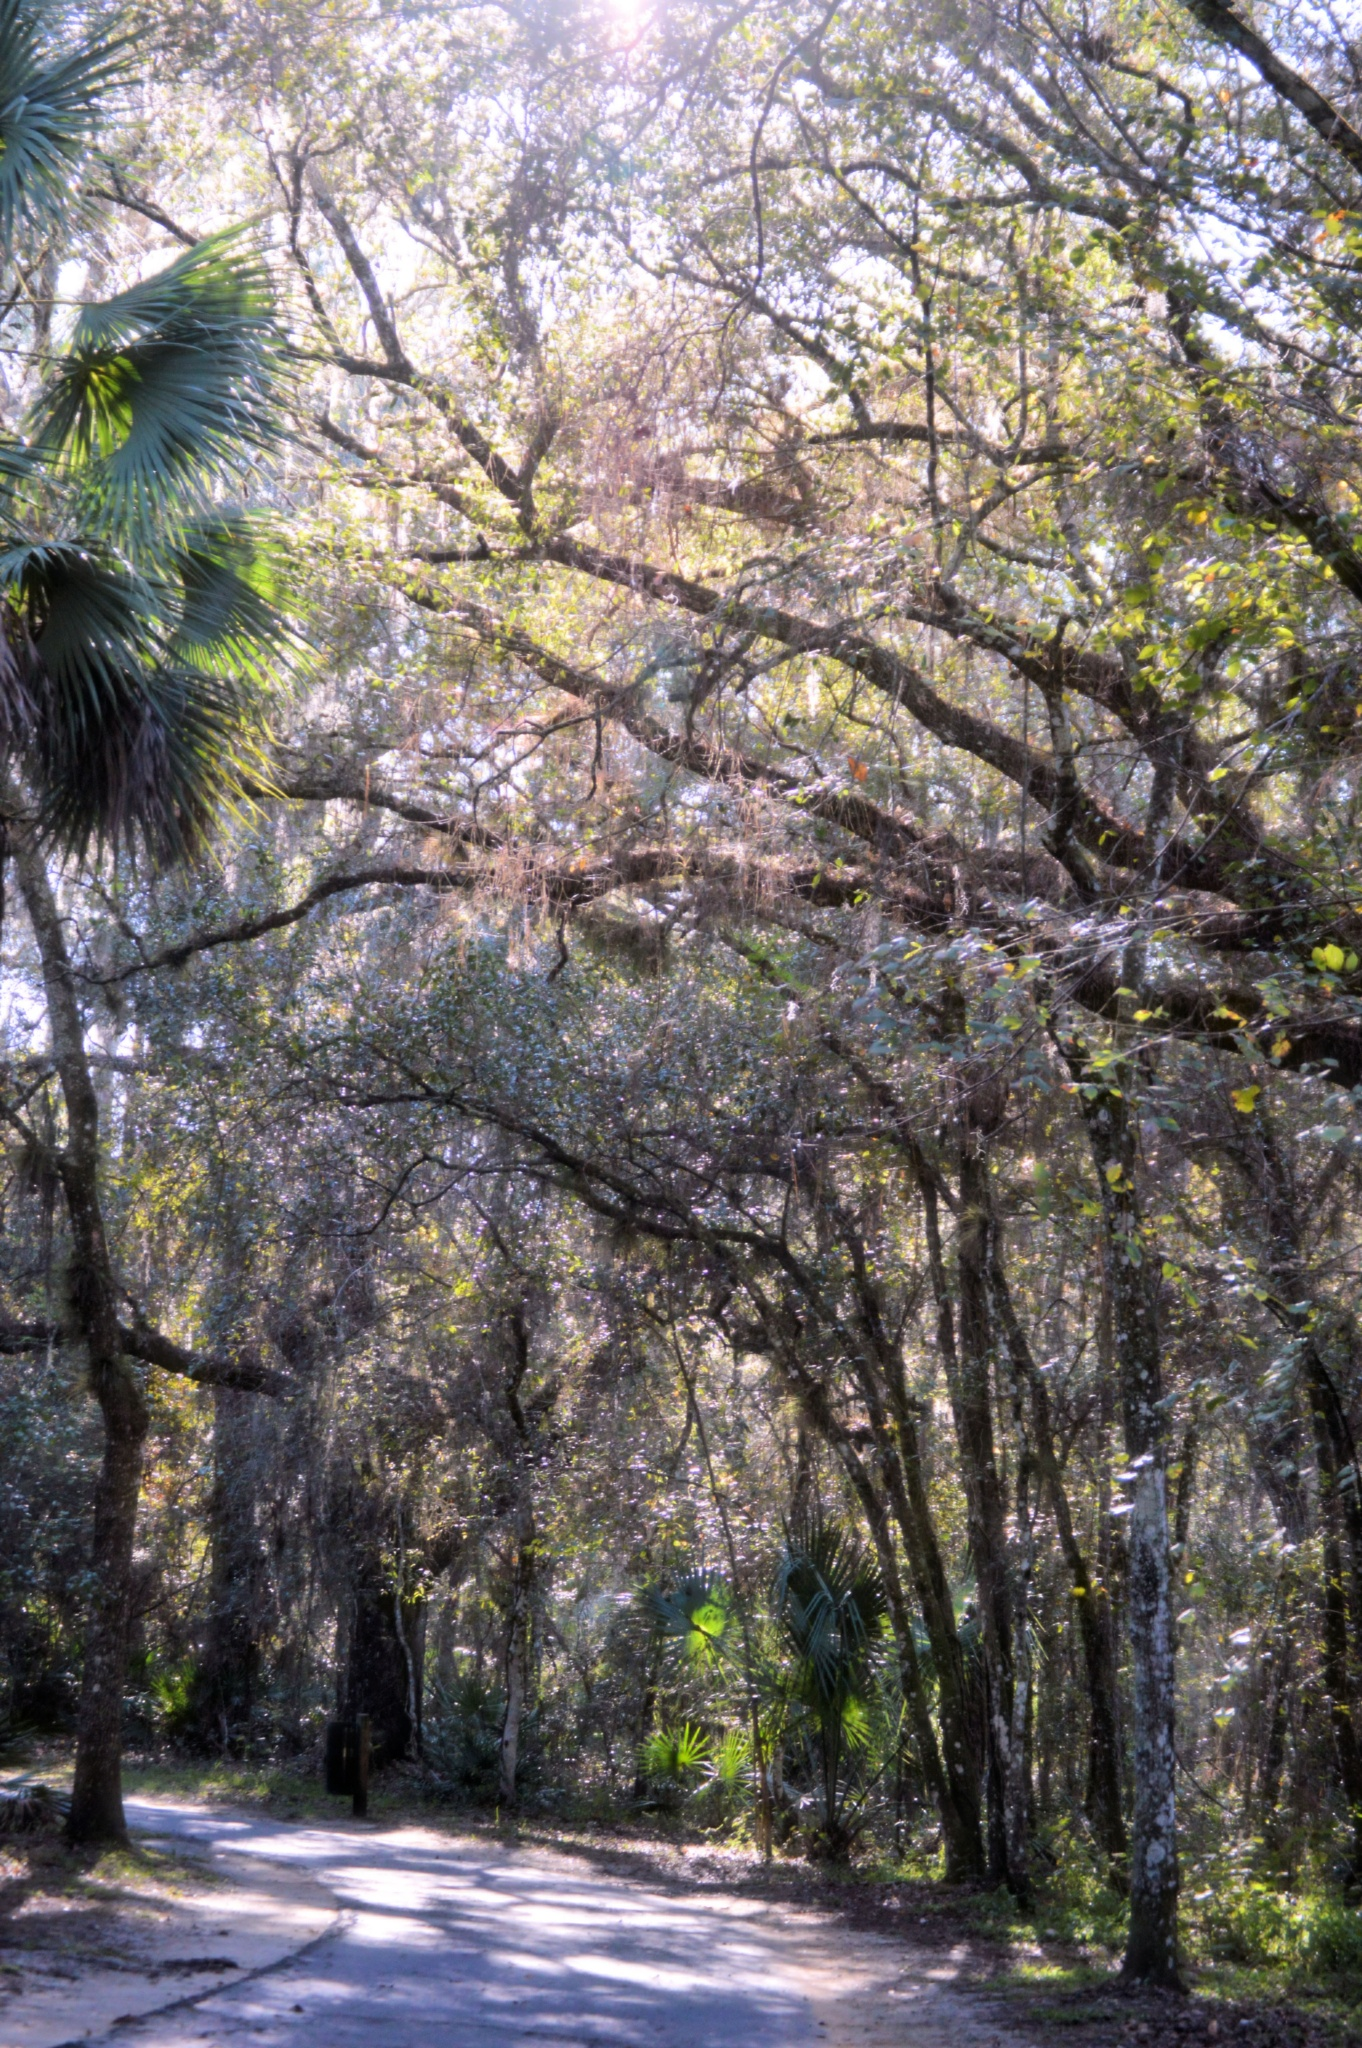 Daily Trail by Jennifer Asher